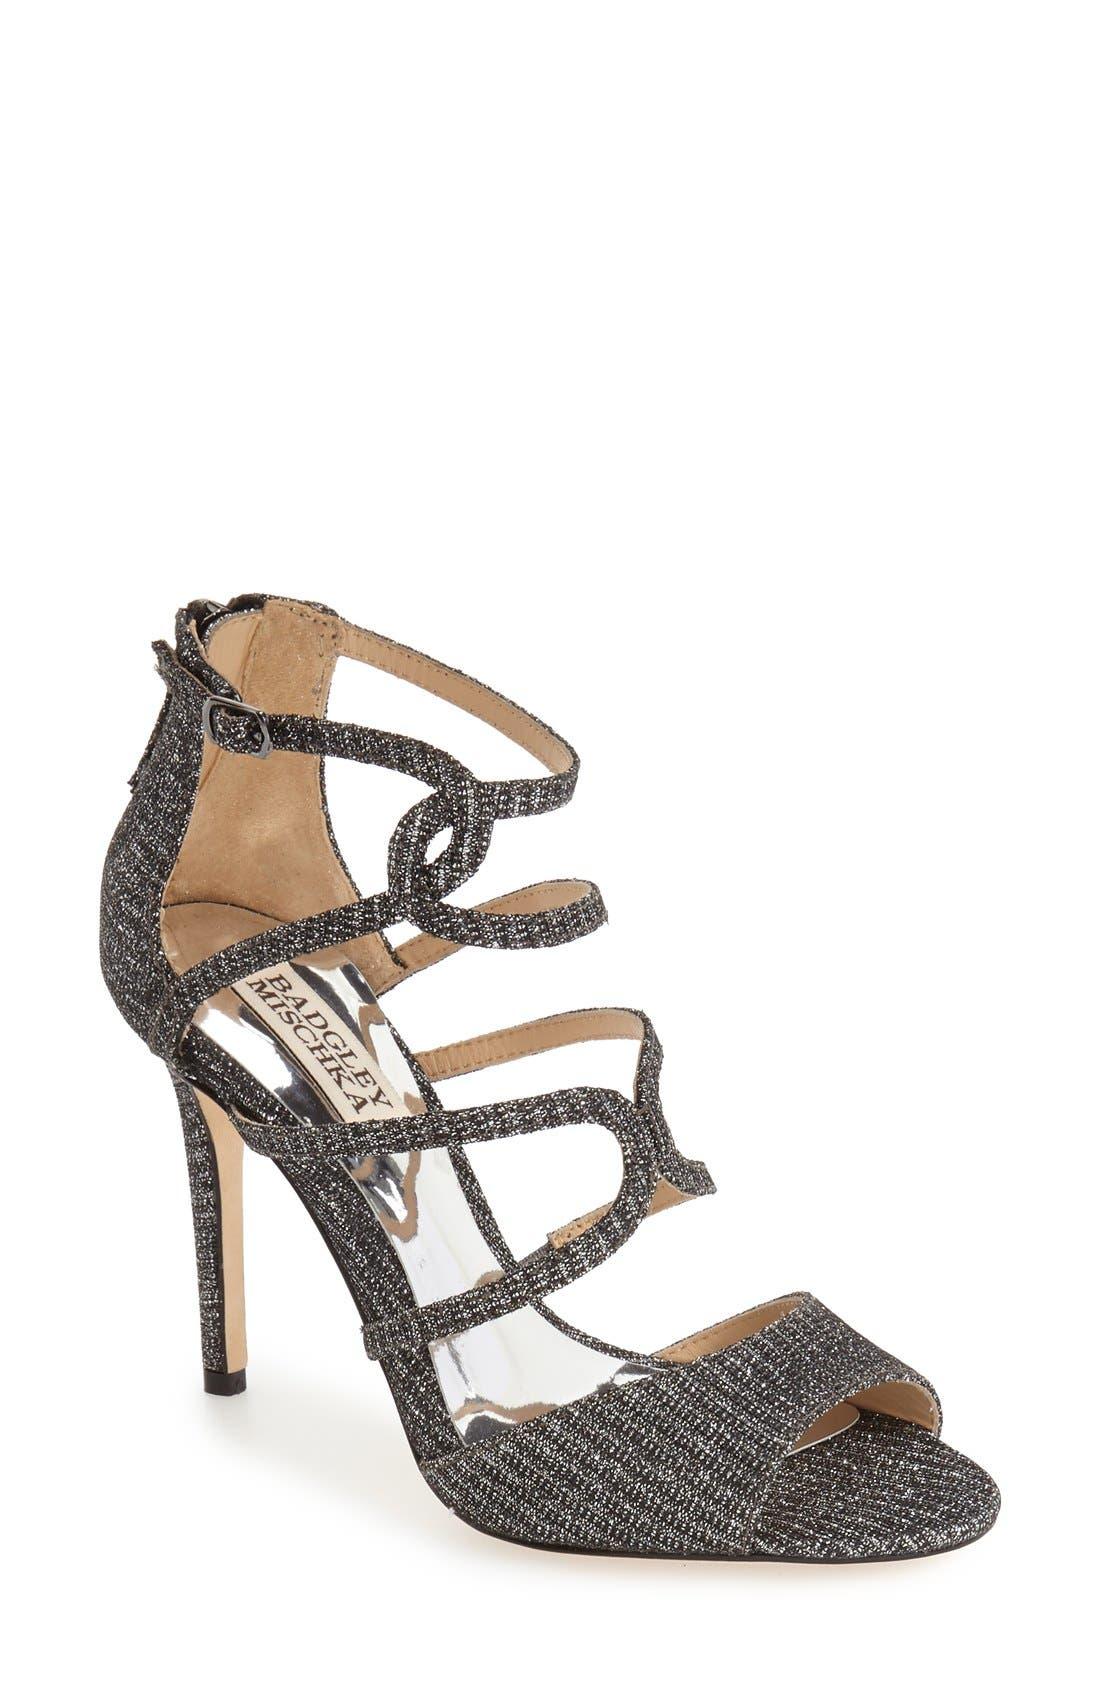 Main Image - Badgley Mischka 'Devon' Strappy Sandal (Women)